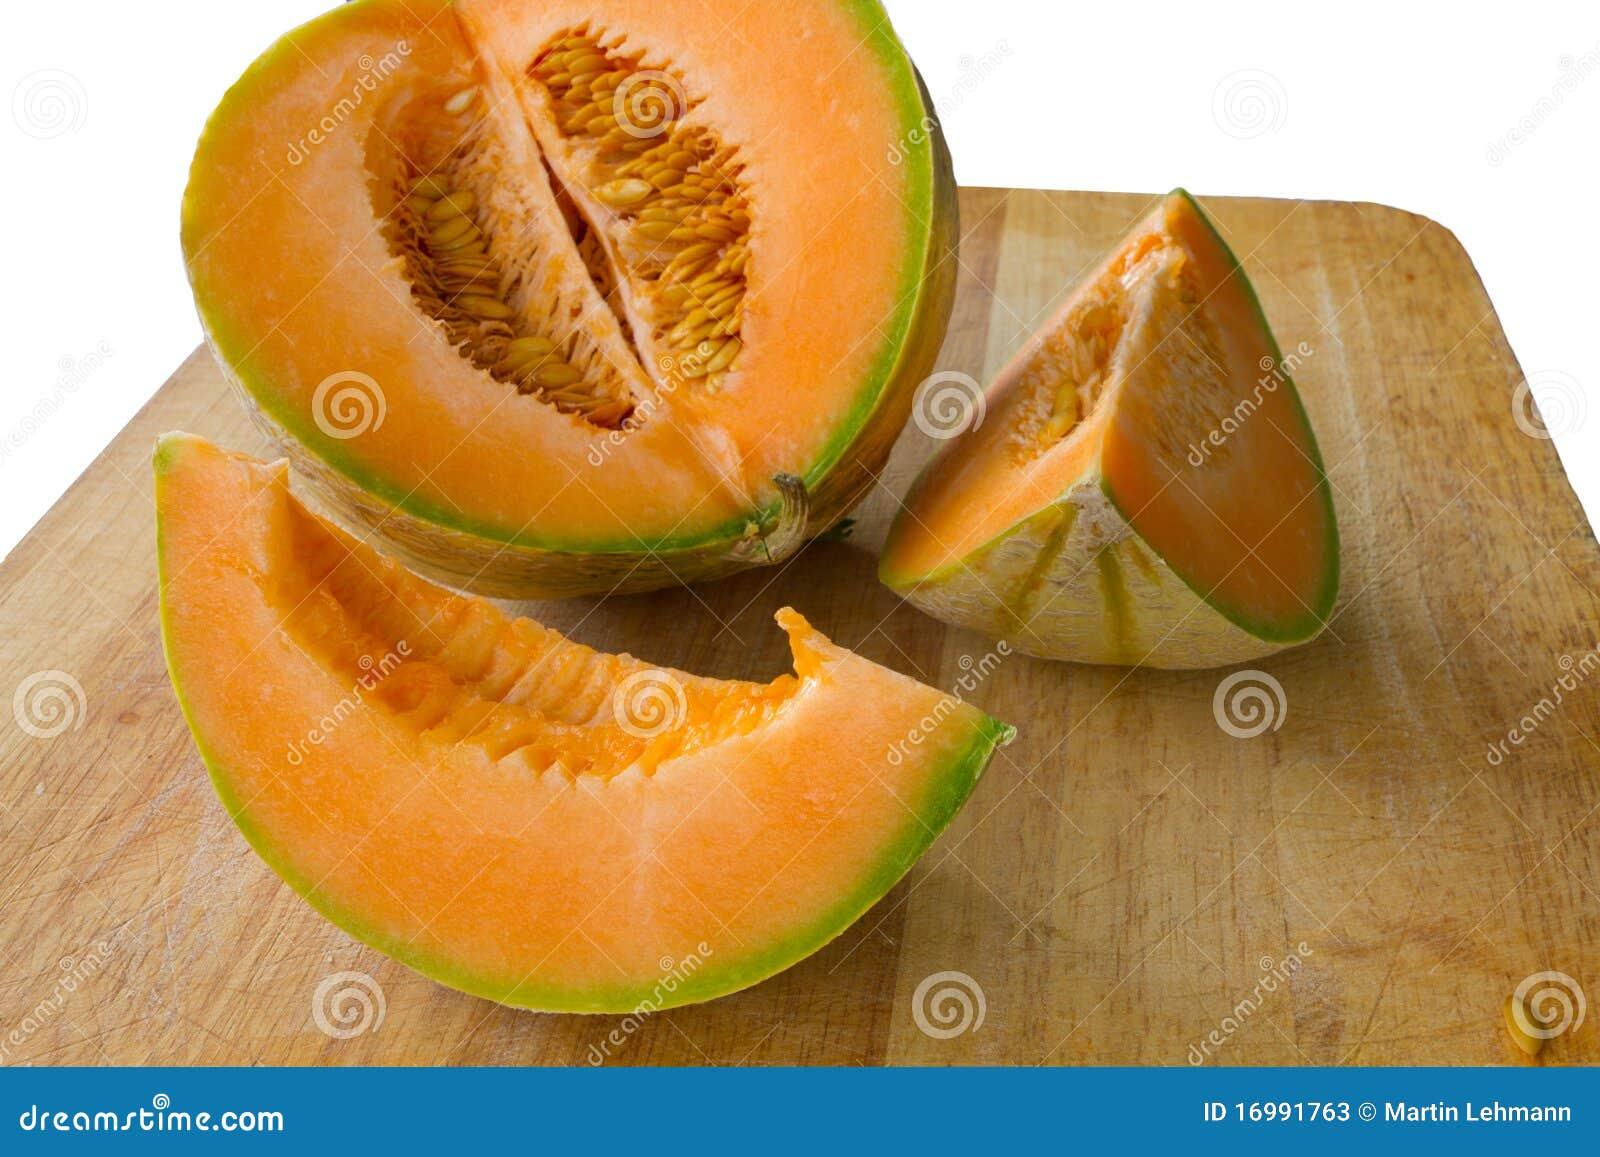 how to keep cantaloupe fresh